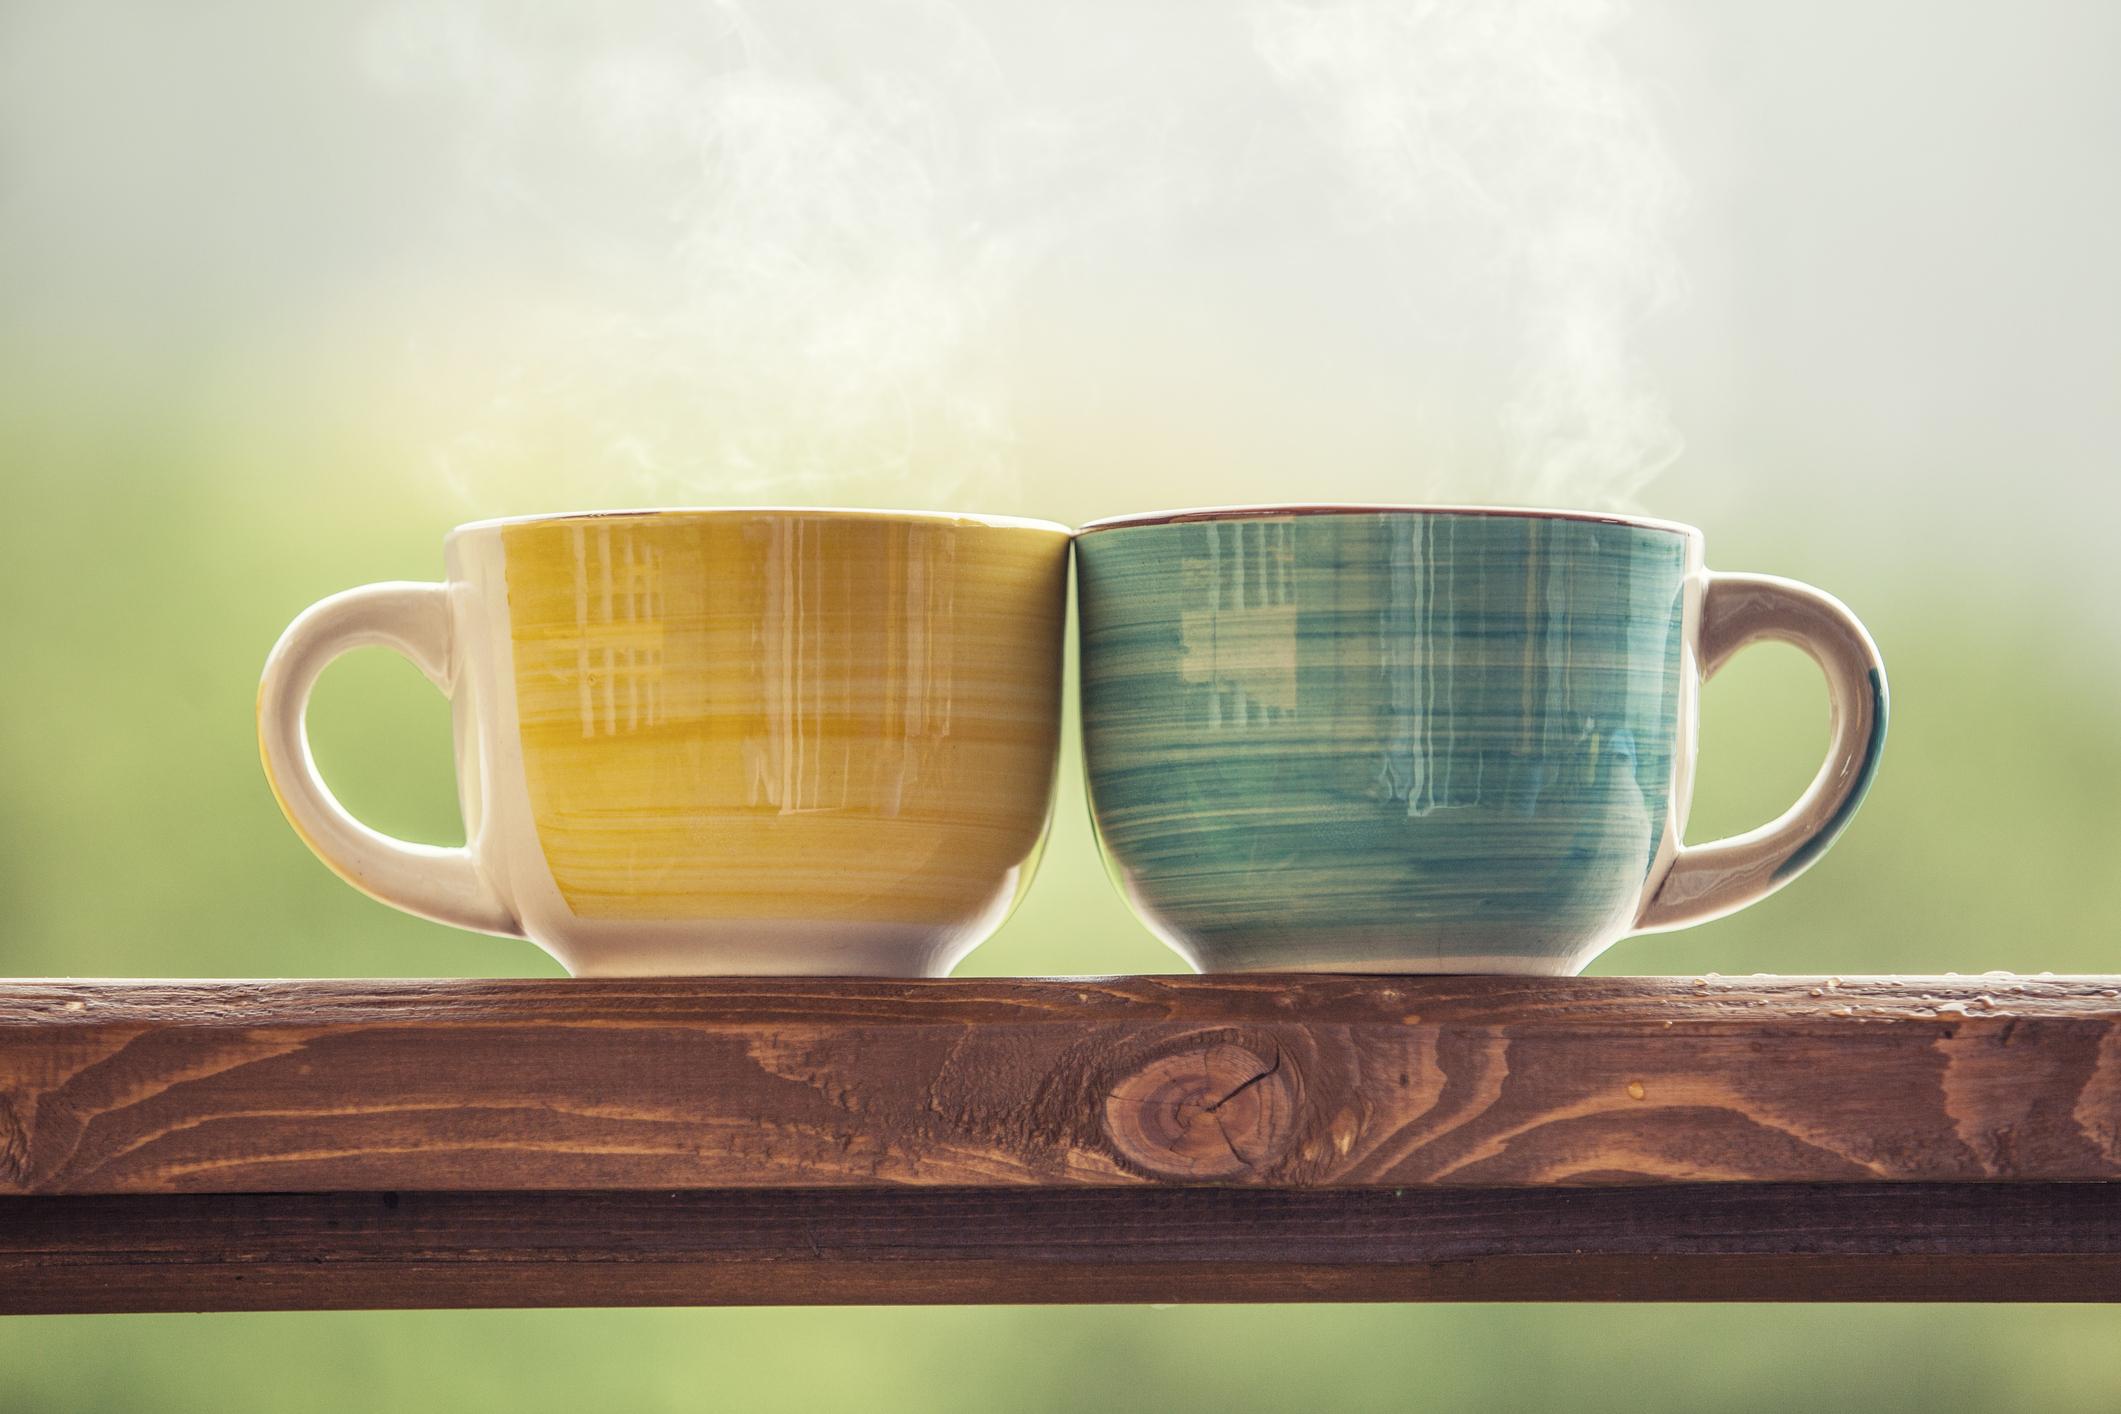 mugs image.jpg